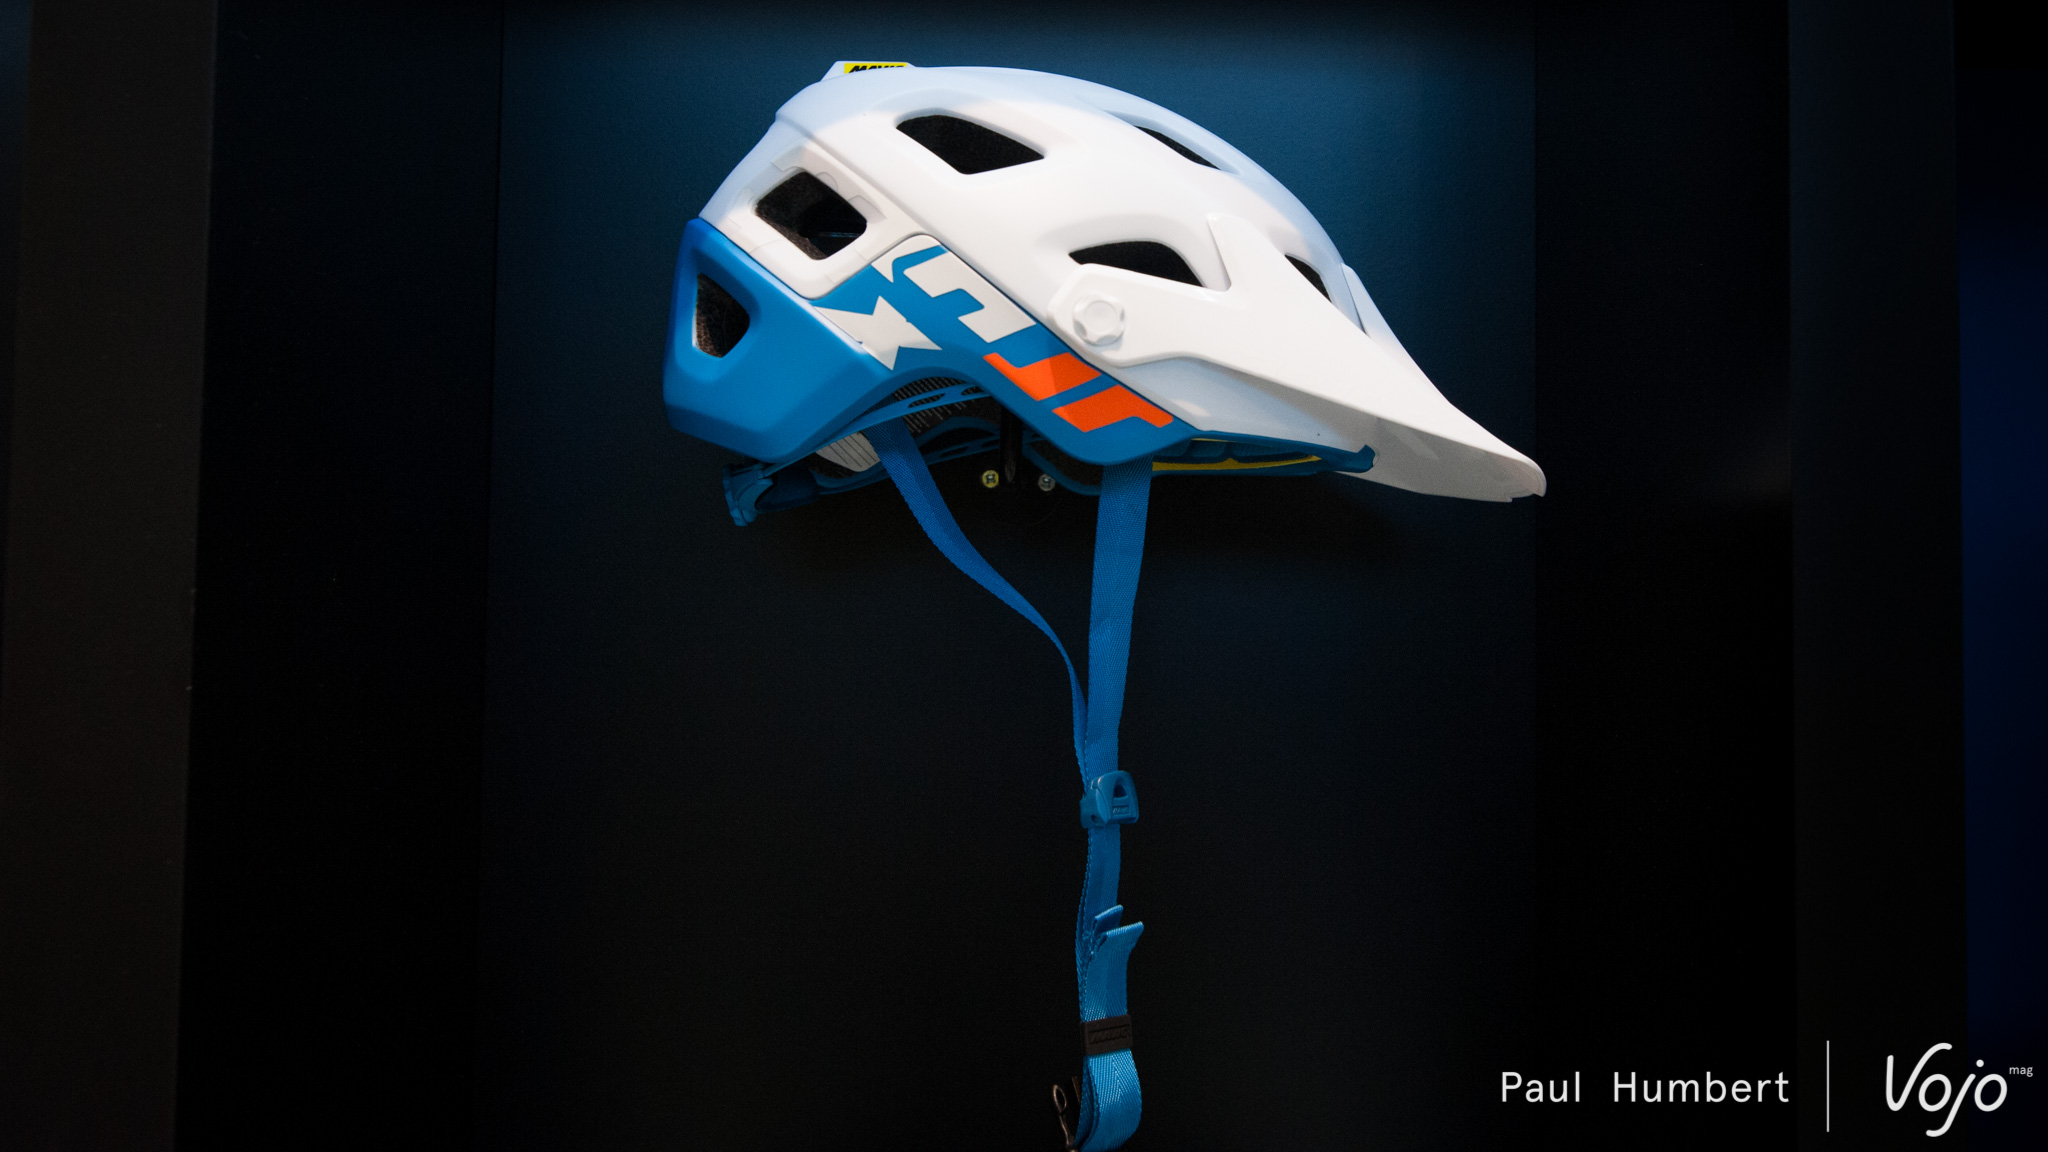 Eurobike-2015-vojo-paul-humbert-10